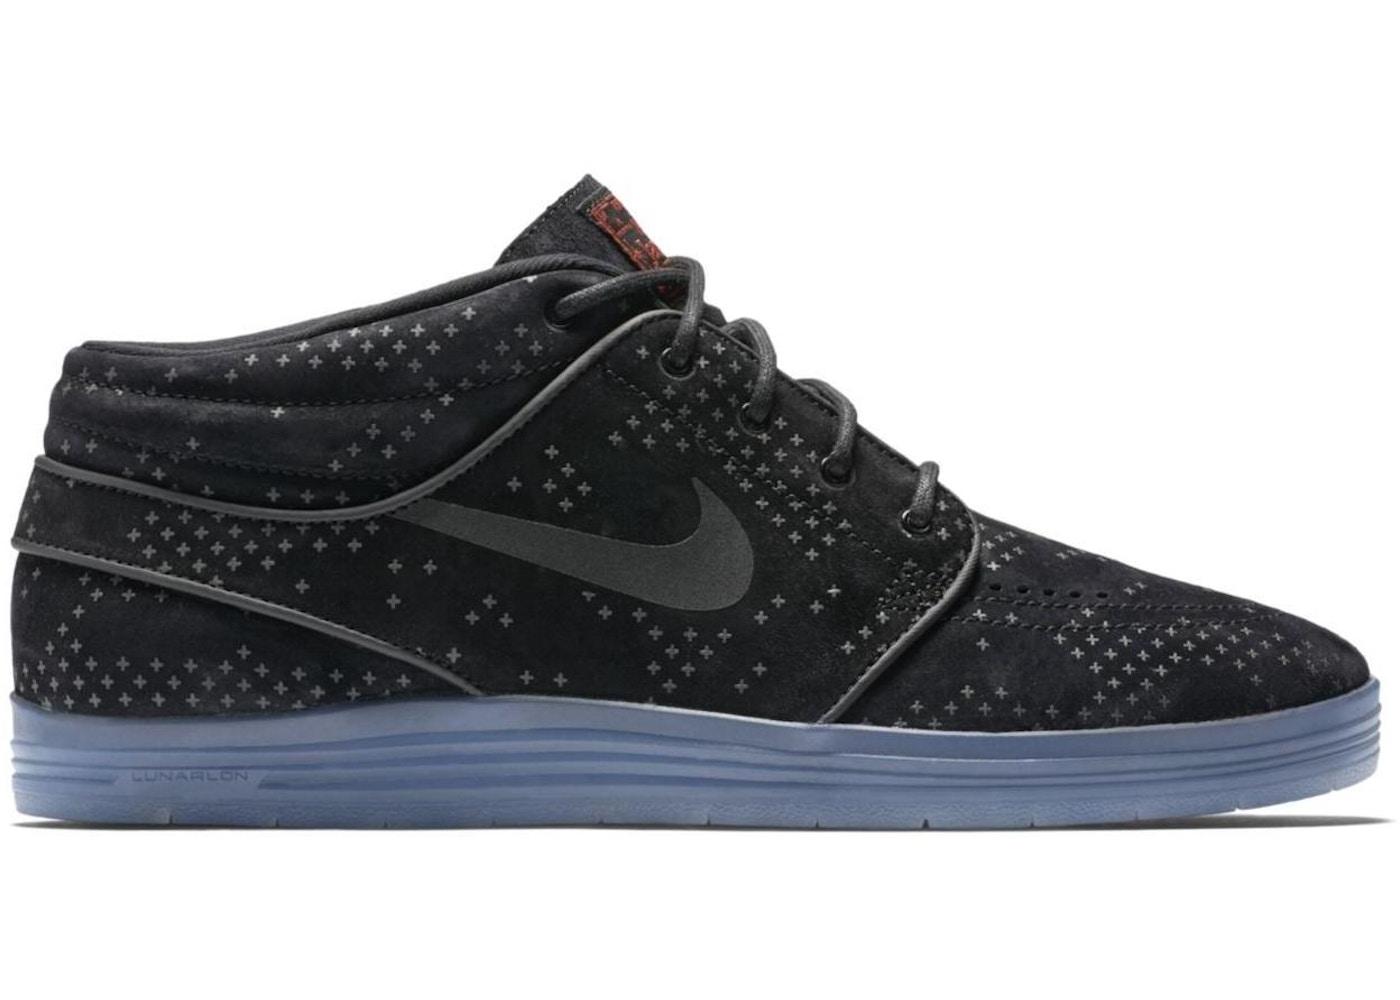 c6759874782d Nike SB Stefan Janoski Mid Flash Pack - 806327-001